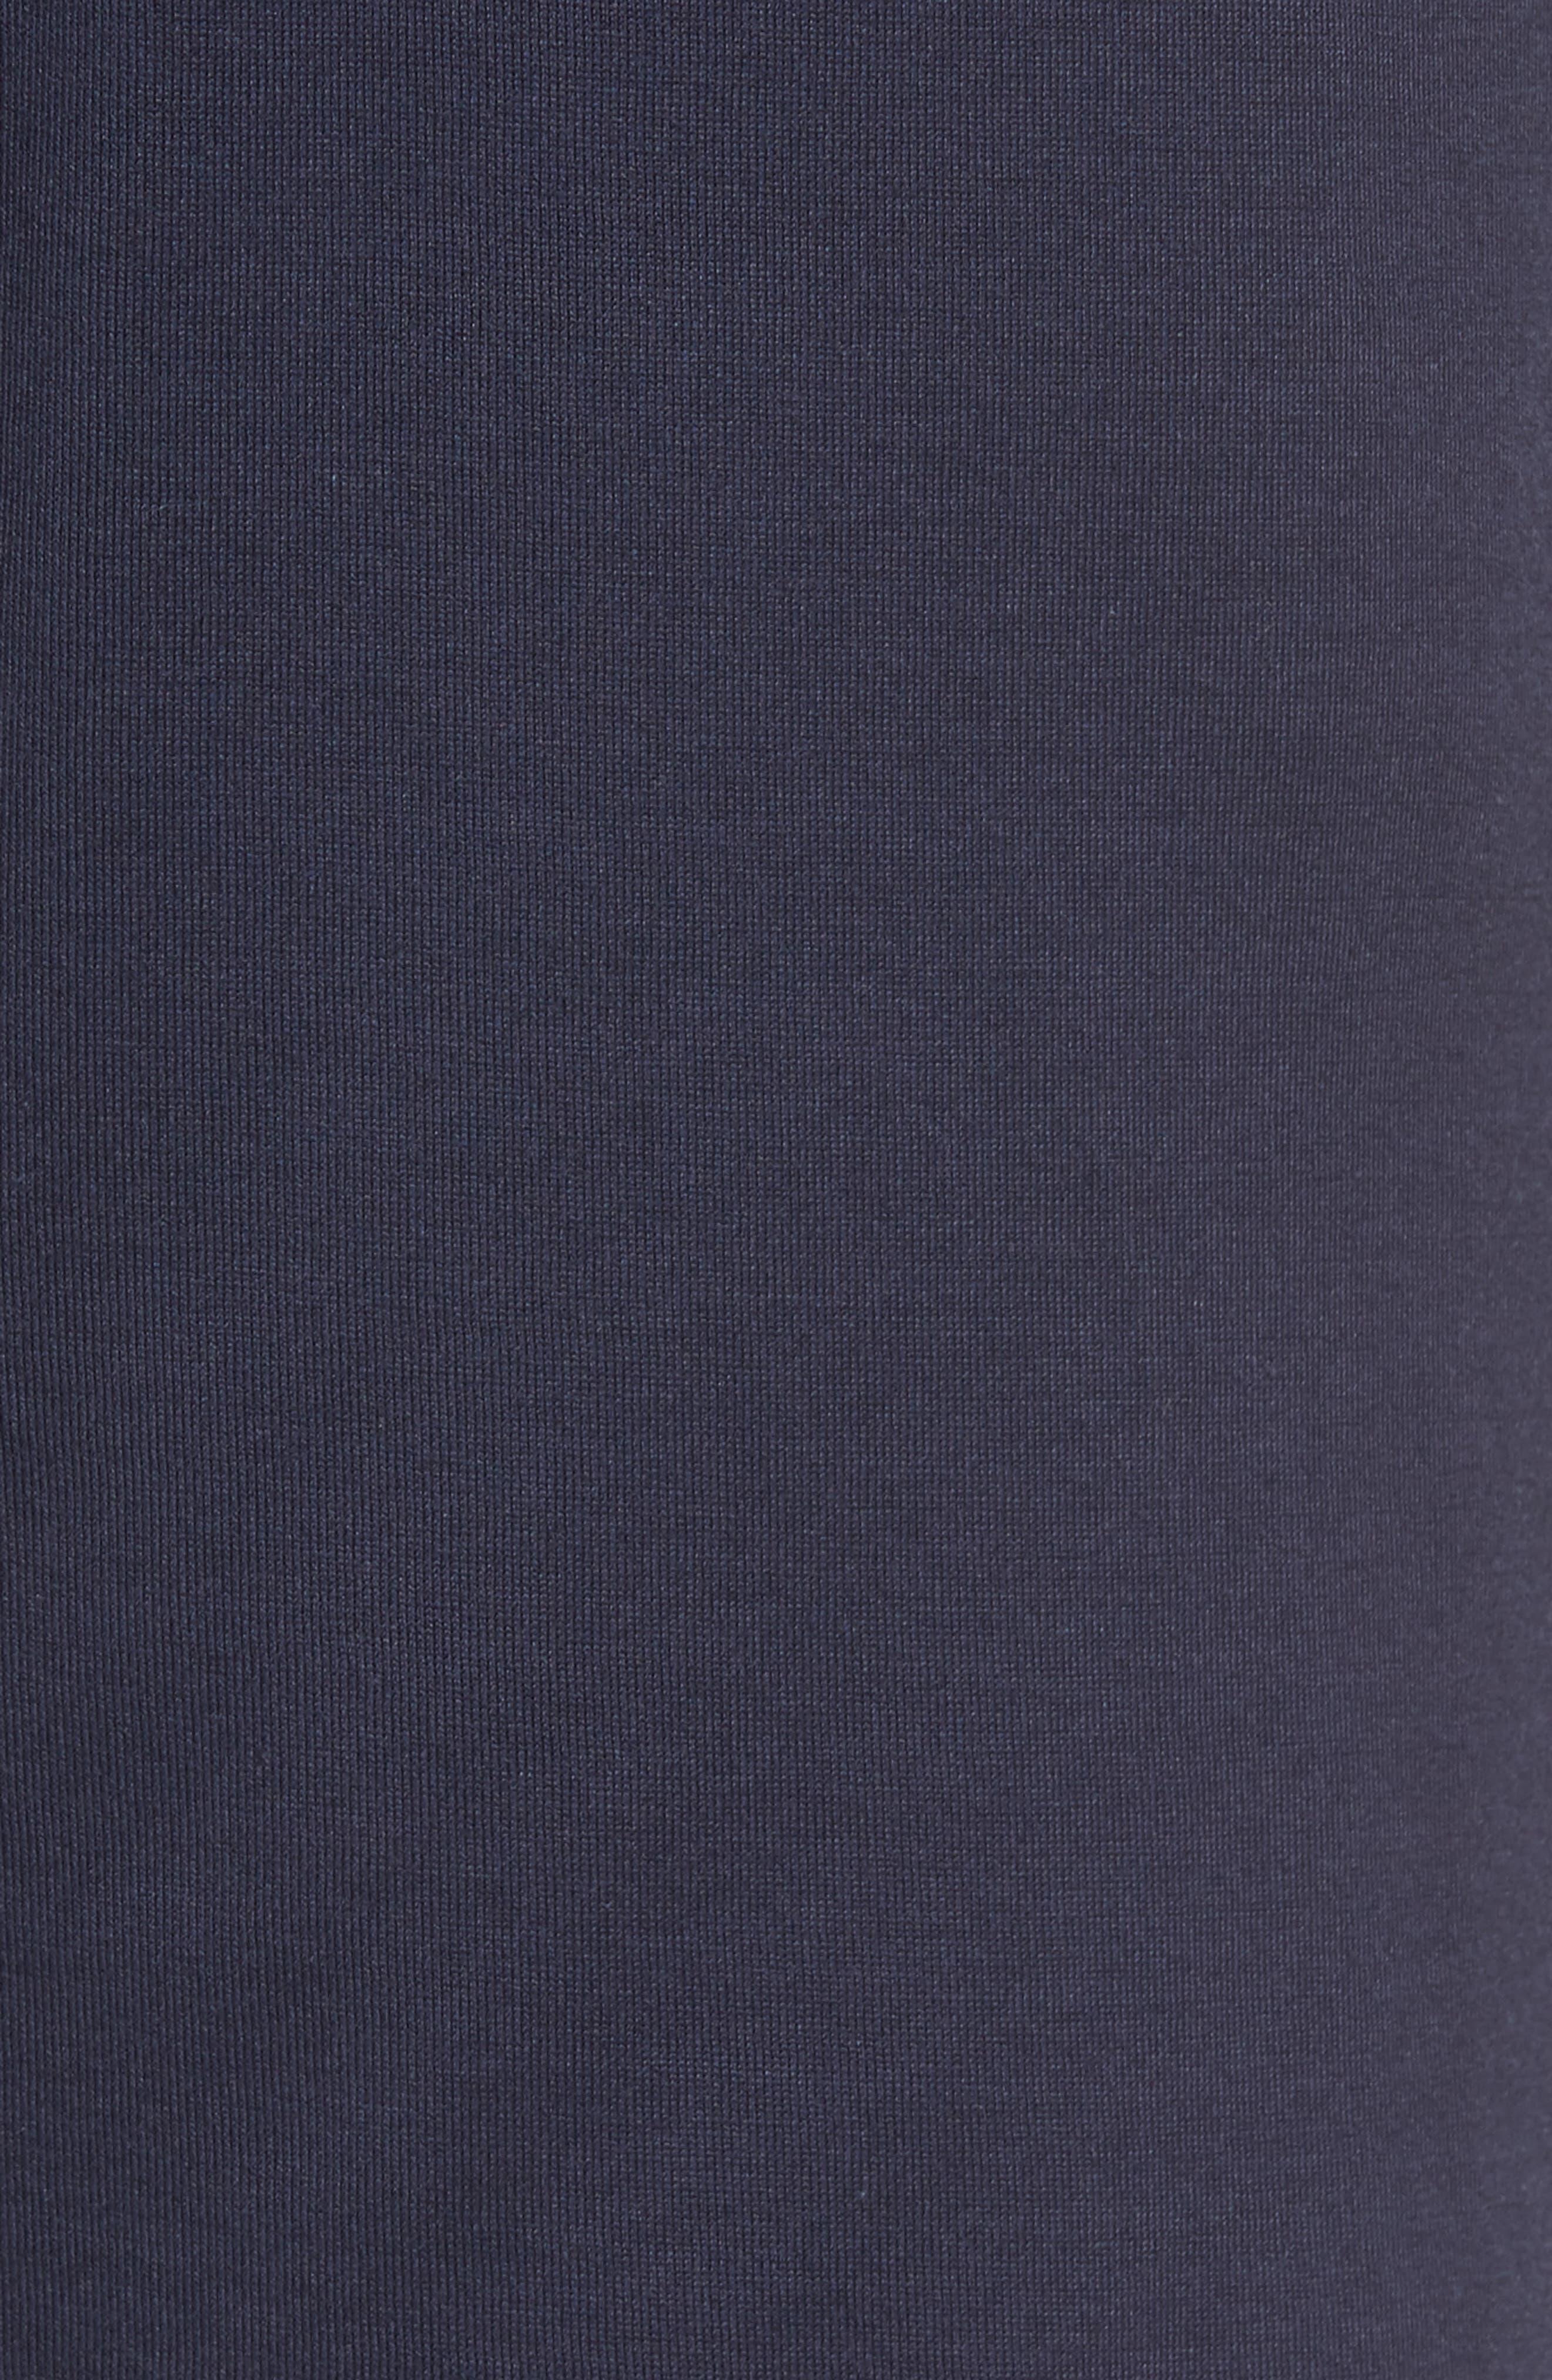 Night & Day Knit Shorts,                             Alternate thumbnail 5, color,                             BLACK IRIS